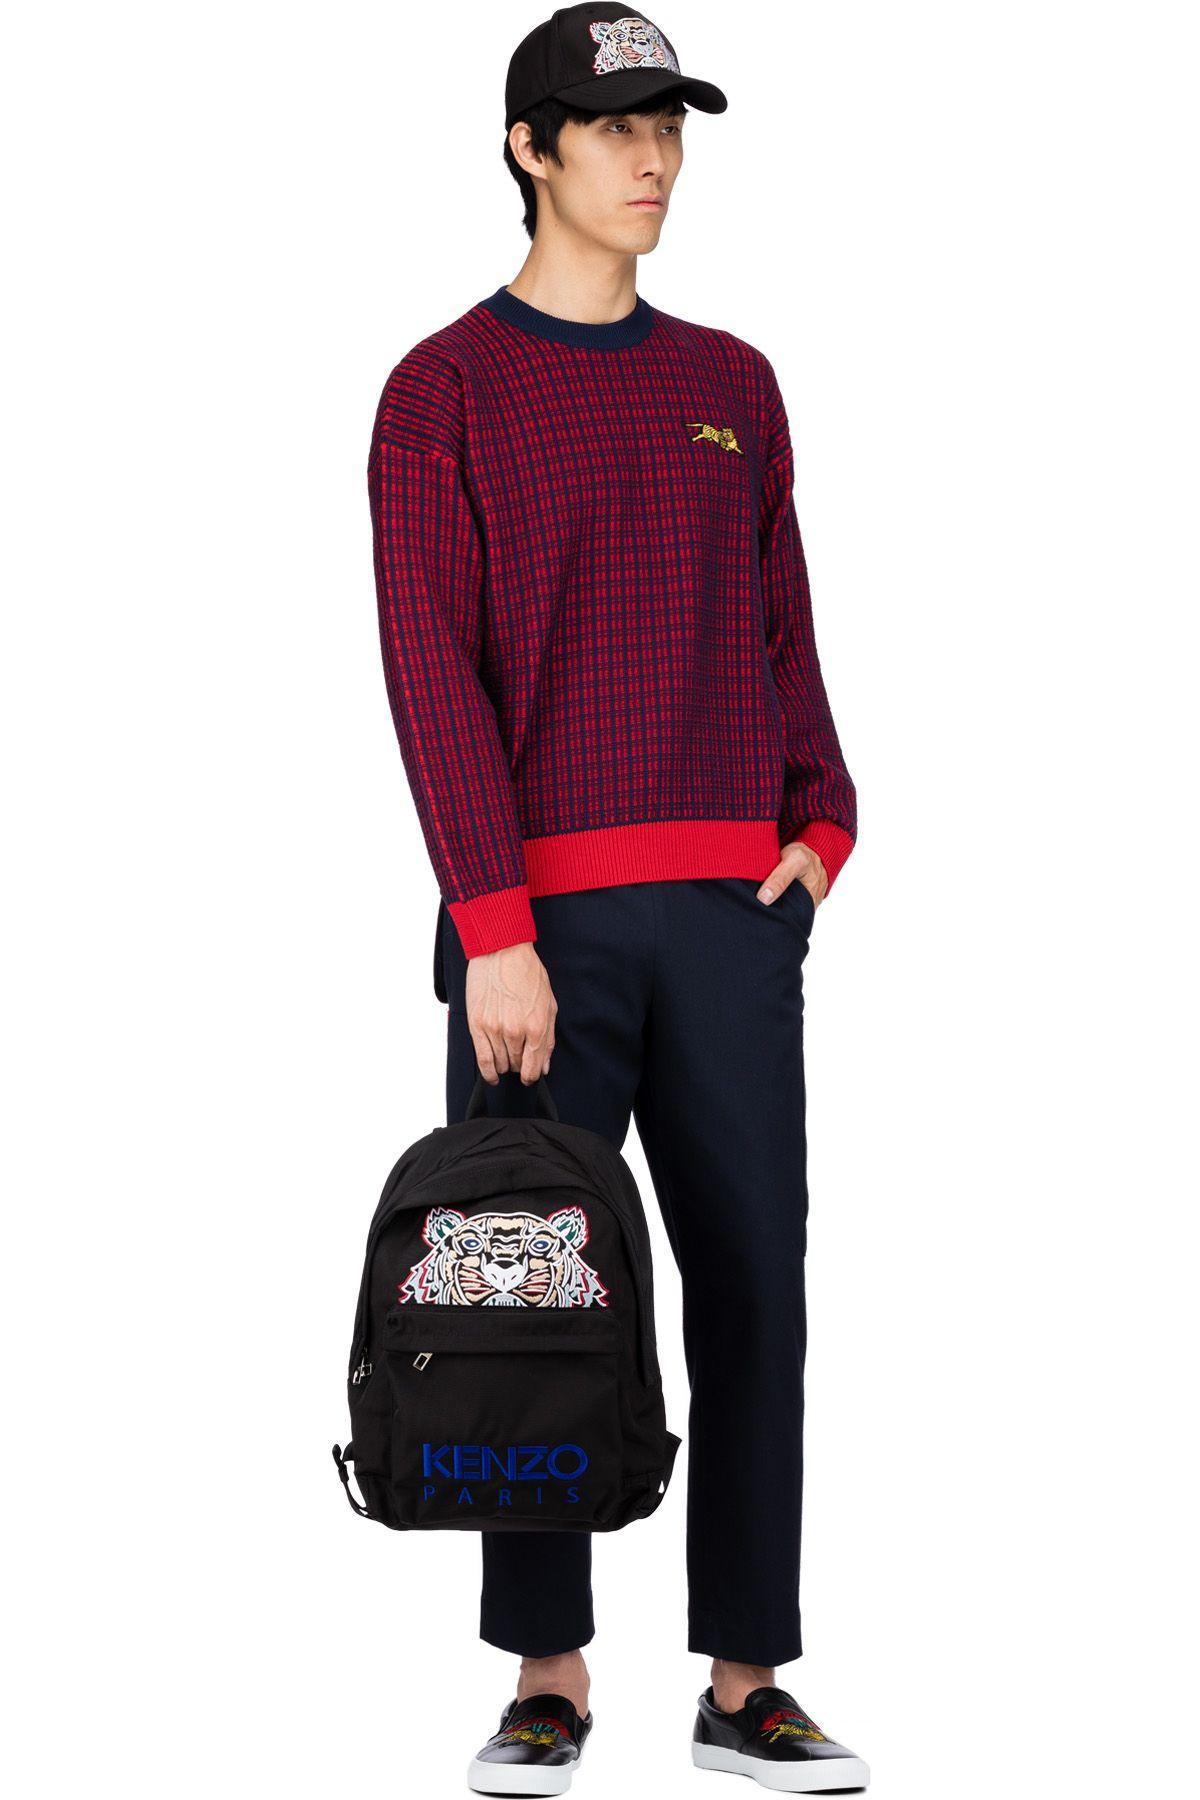 0cbad16d Print Logo, Canvas Backpack, Black Backpack, Metal Buckles, Zipper Pulls,  Kenzo